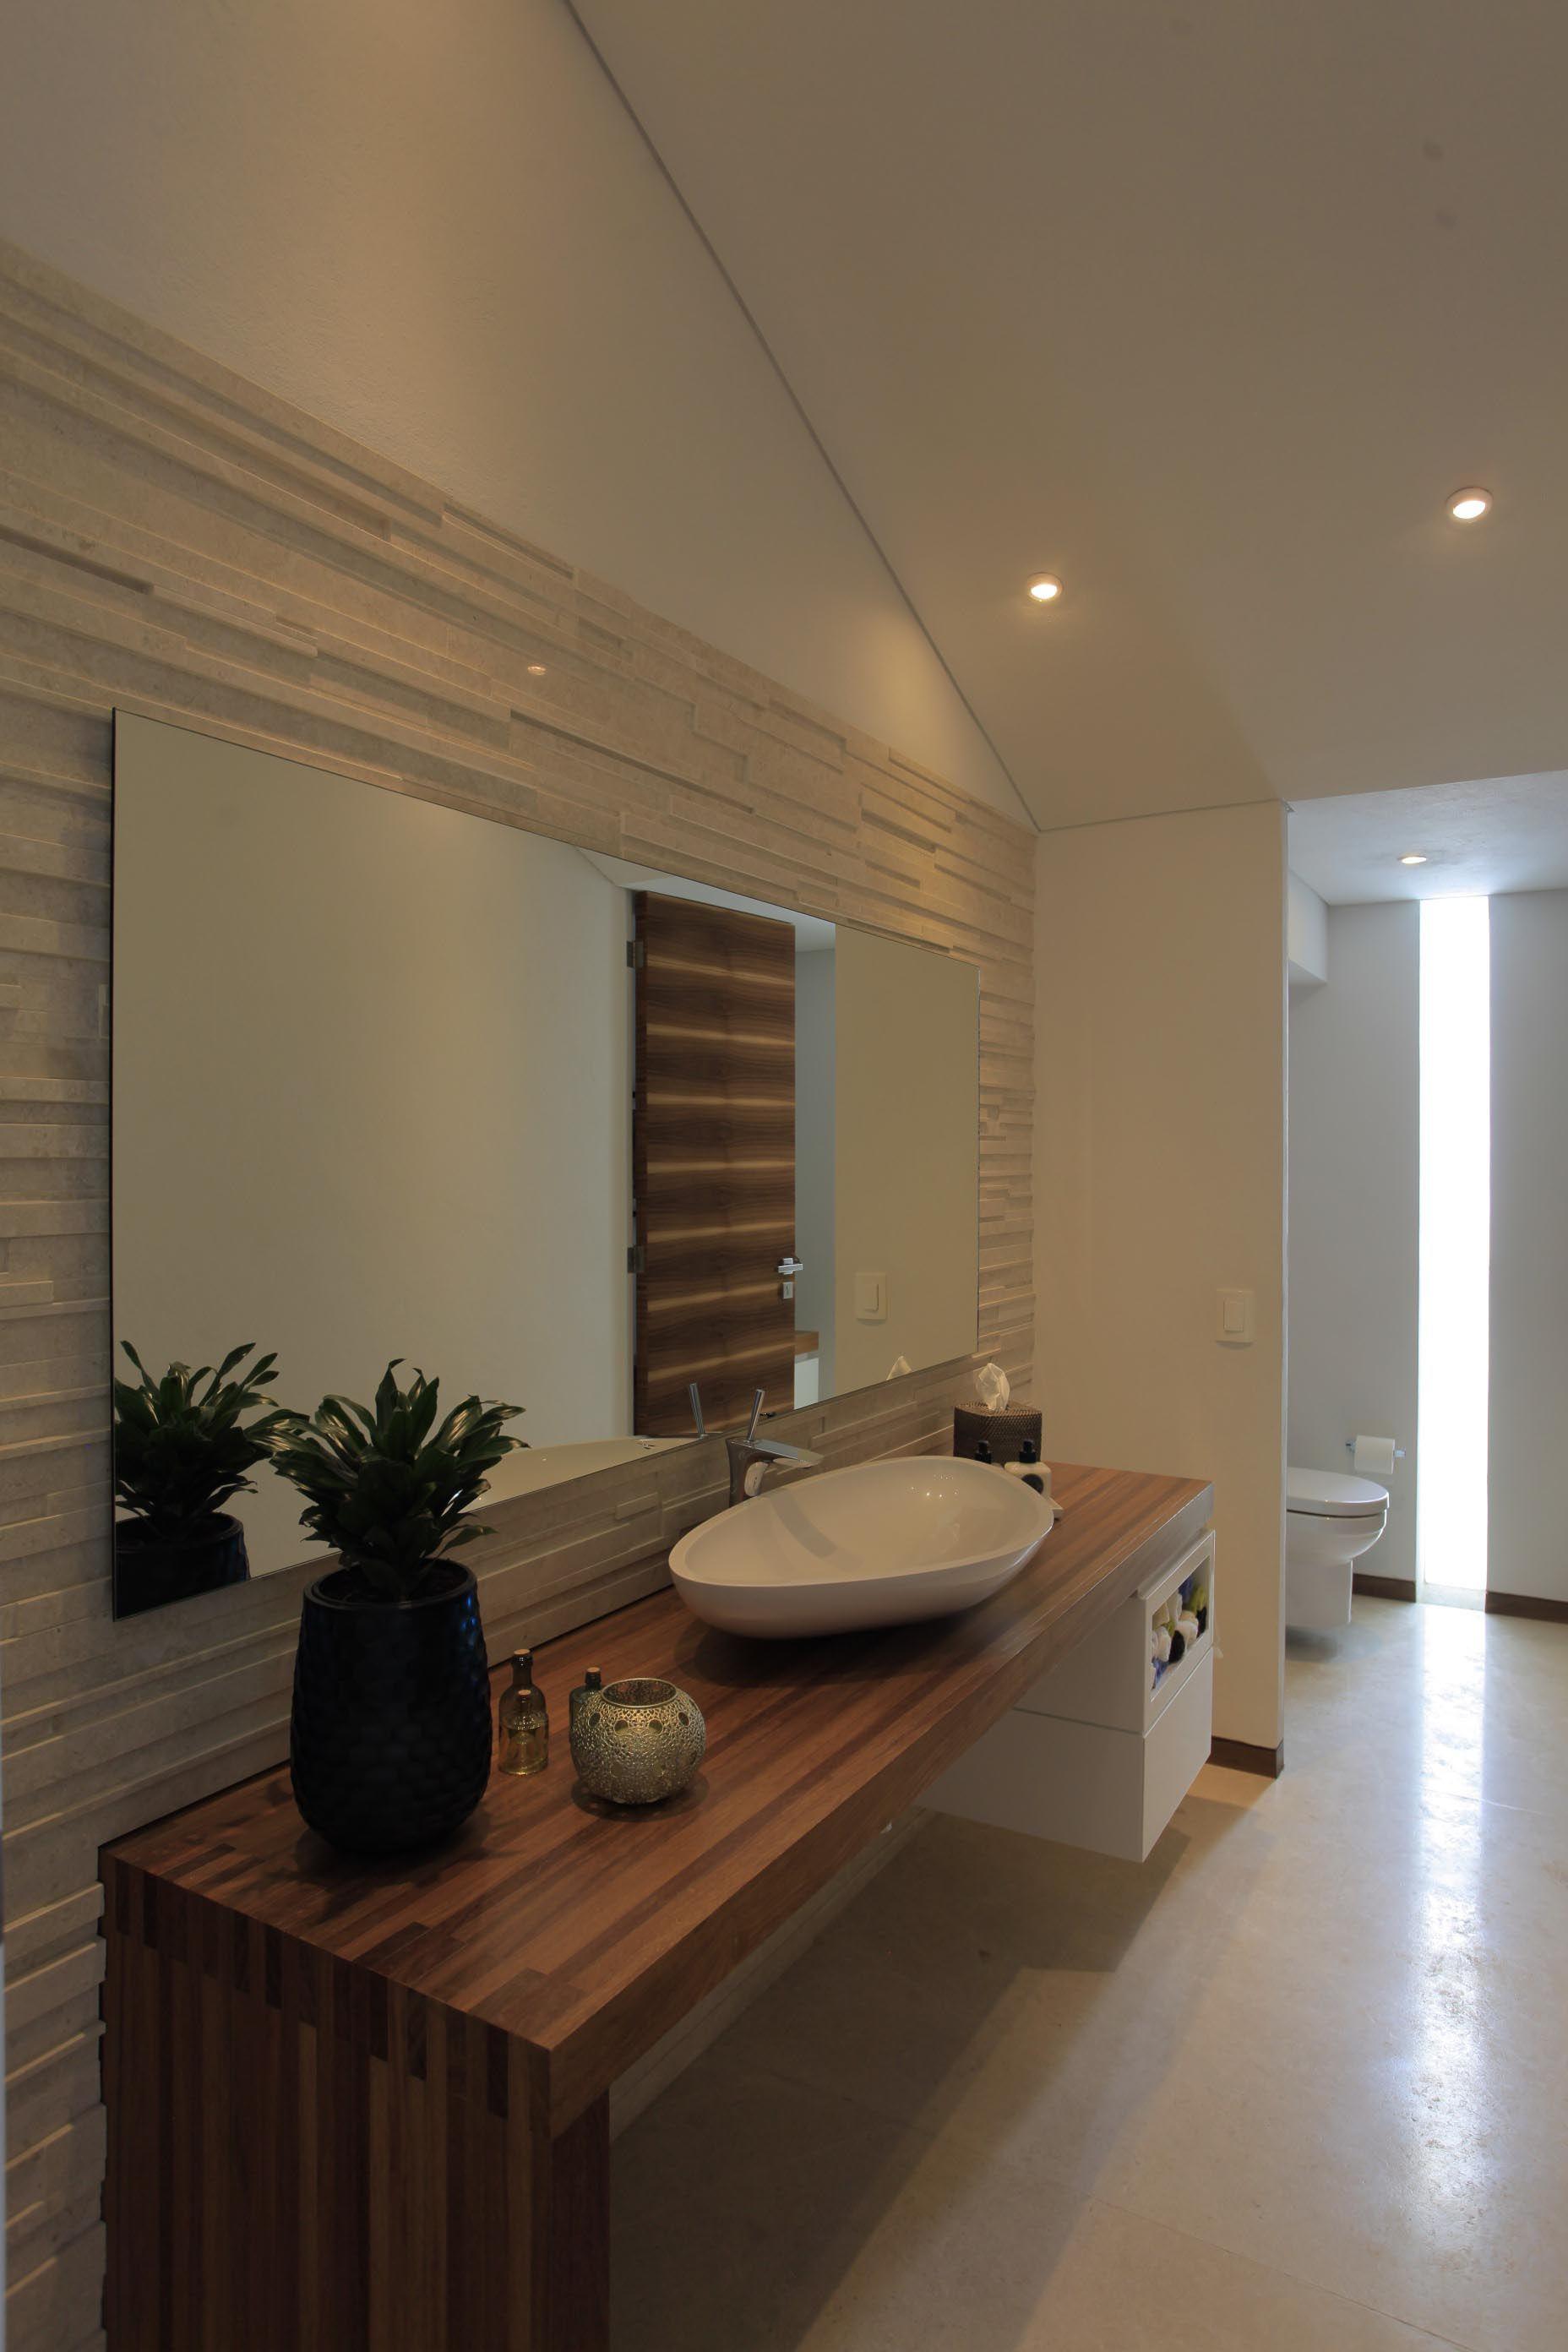 Simple house interior design ideas hernandez silva arquitectos  project  casa siete  image